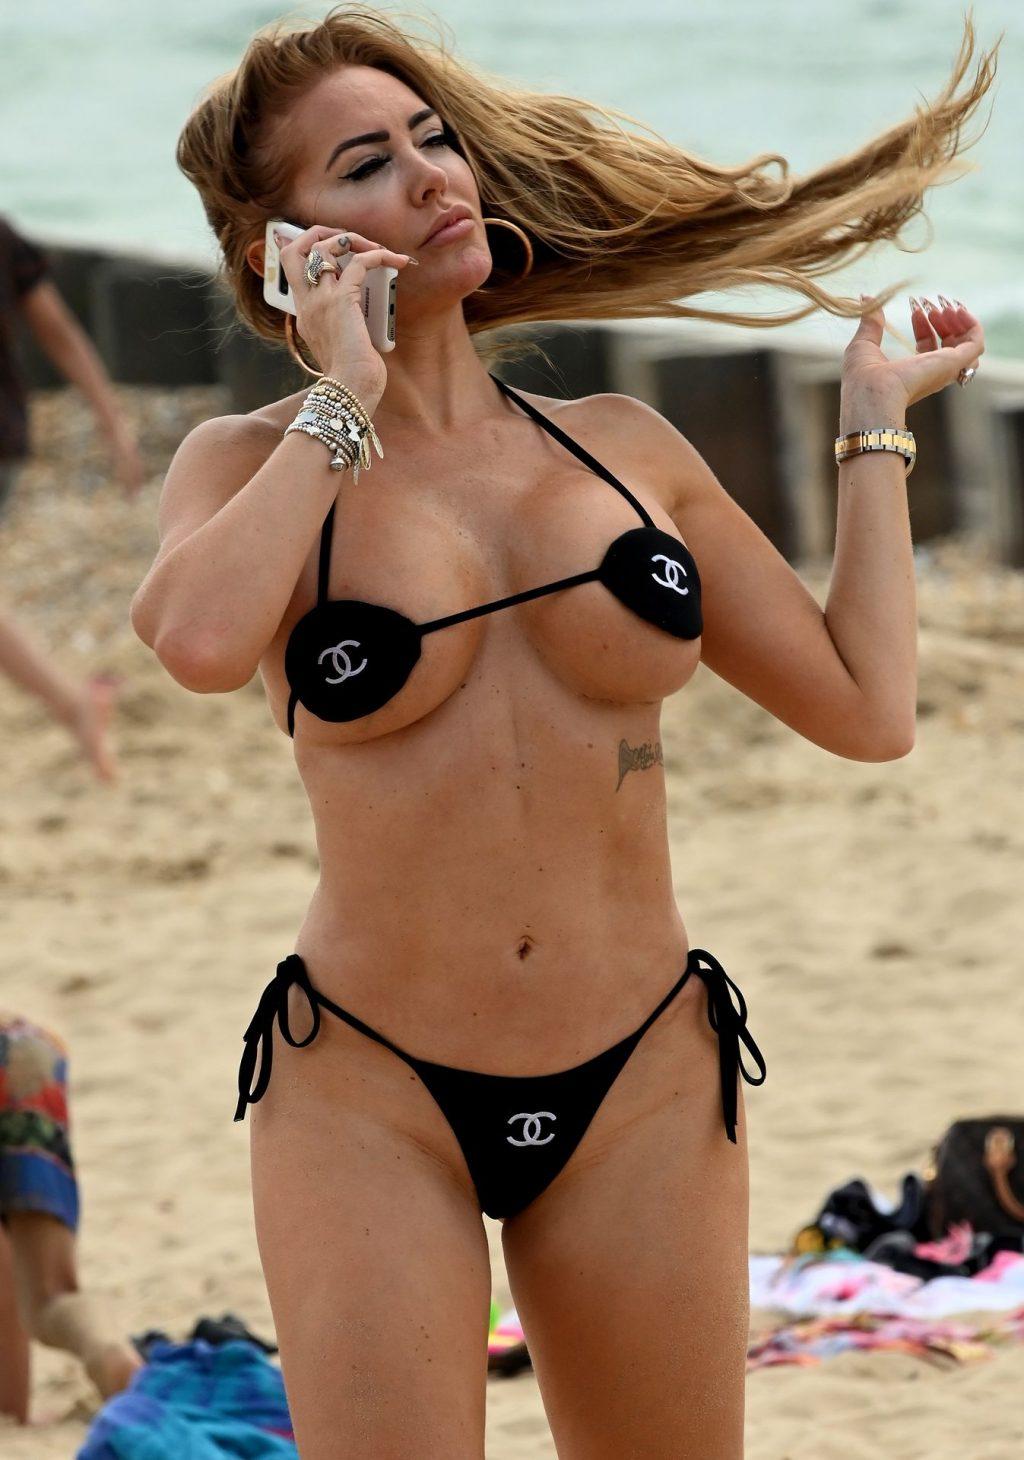 Aisleyne Horgan-Wallace Enjoys a Day in a Tiny Bikini (35 Photos)